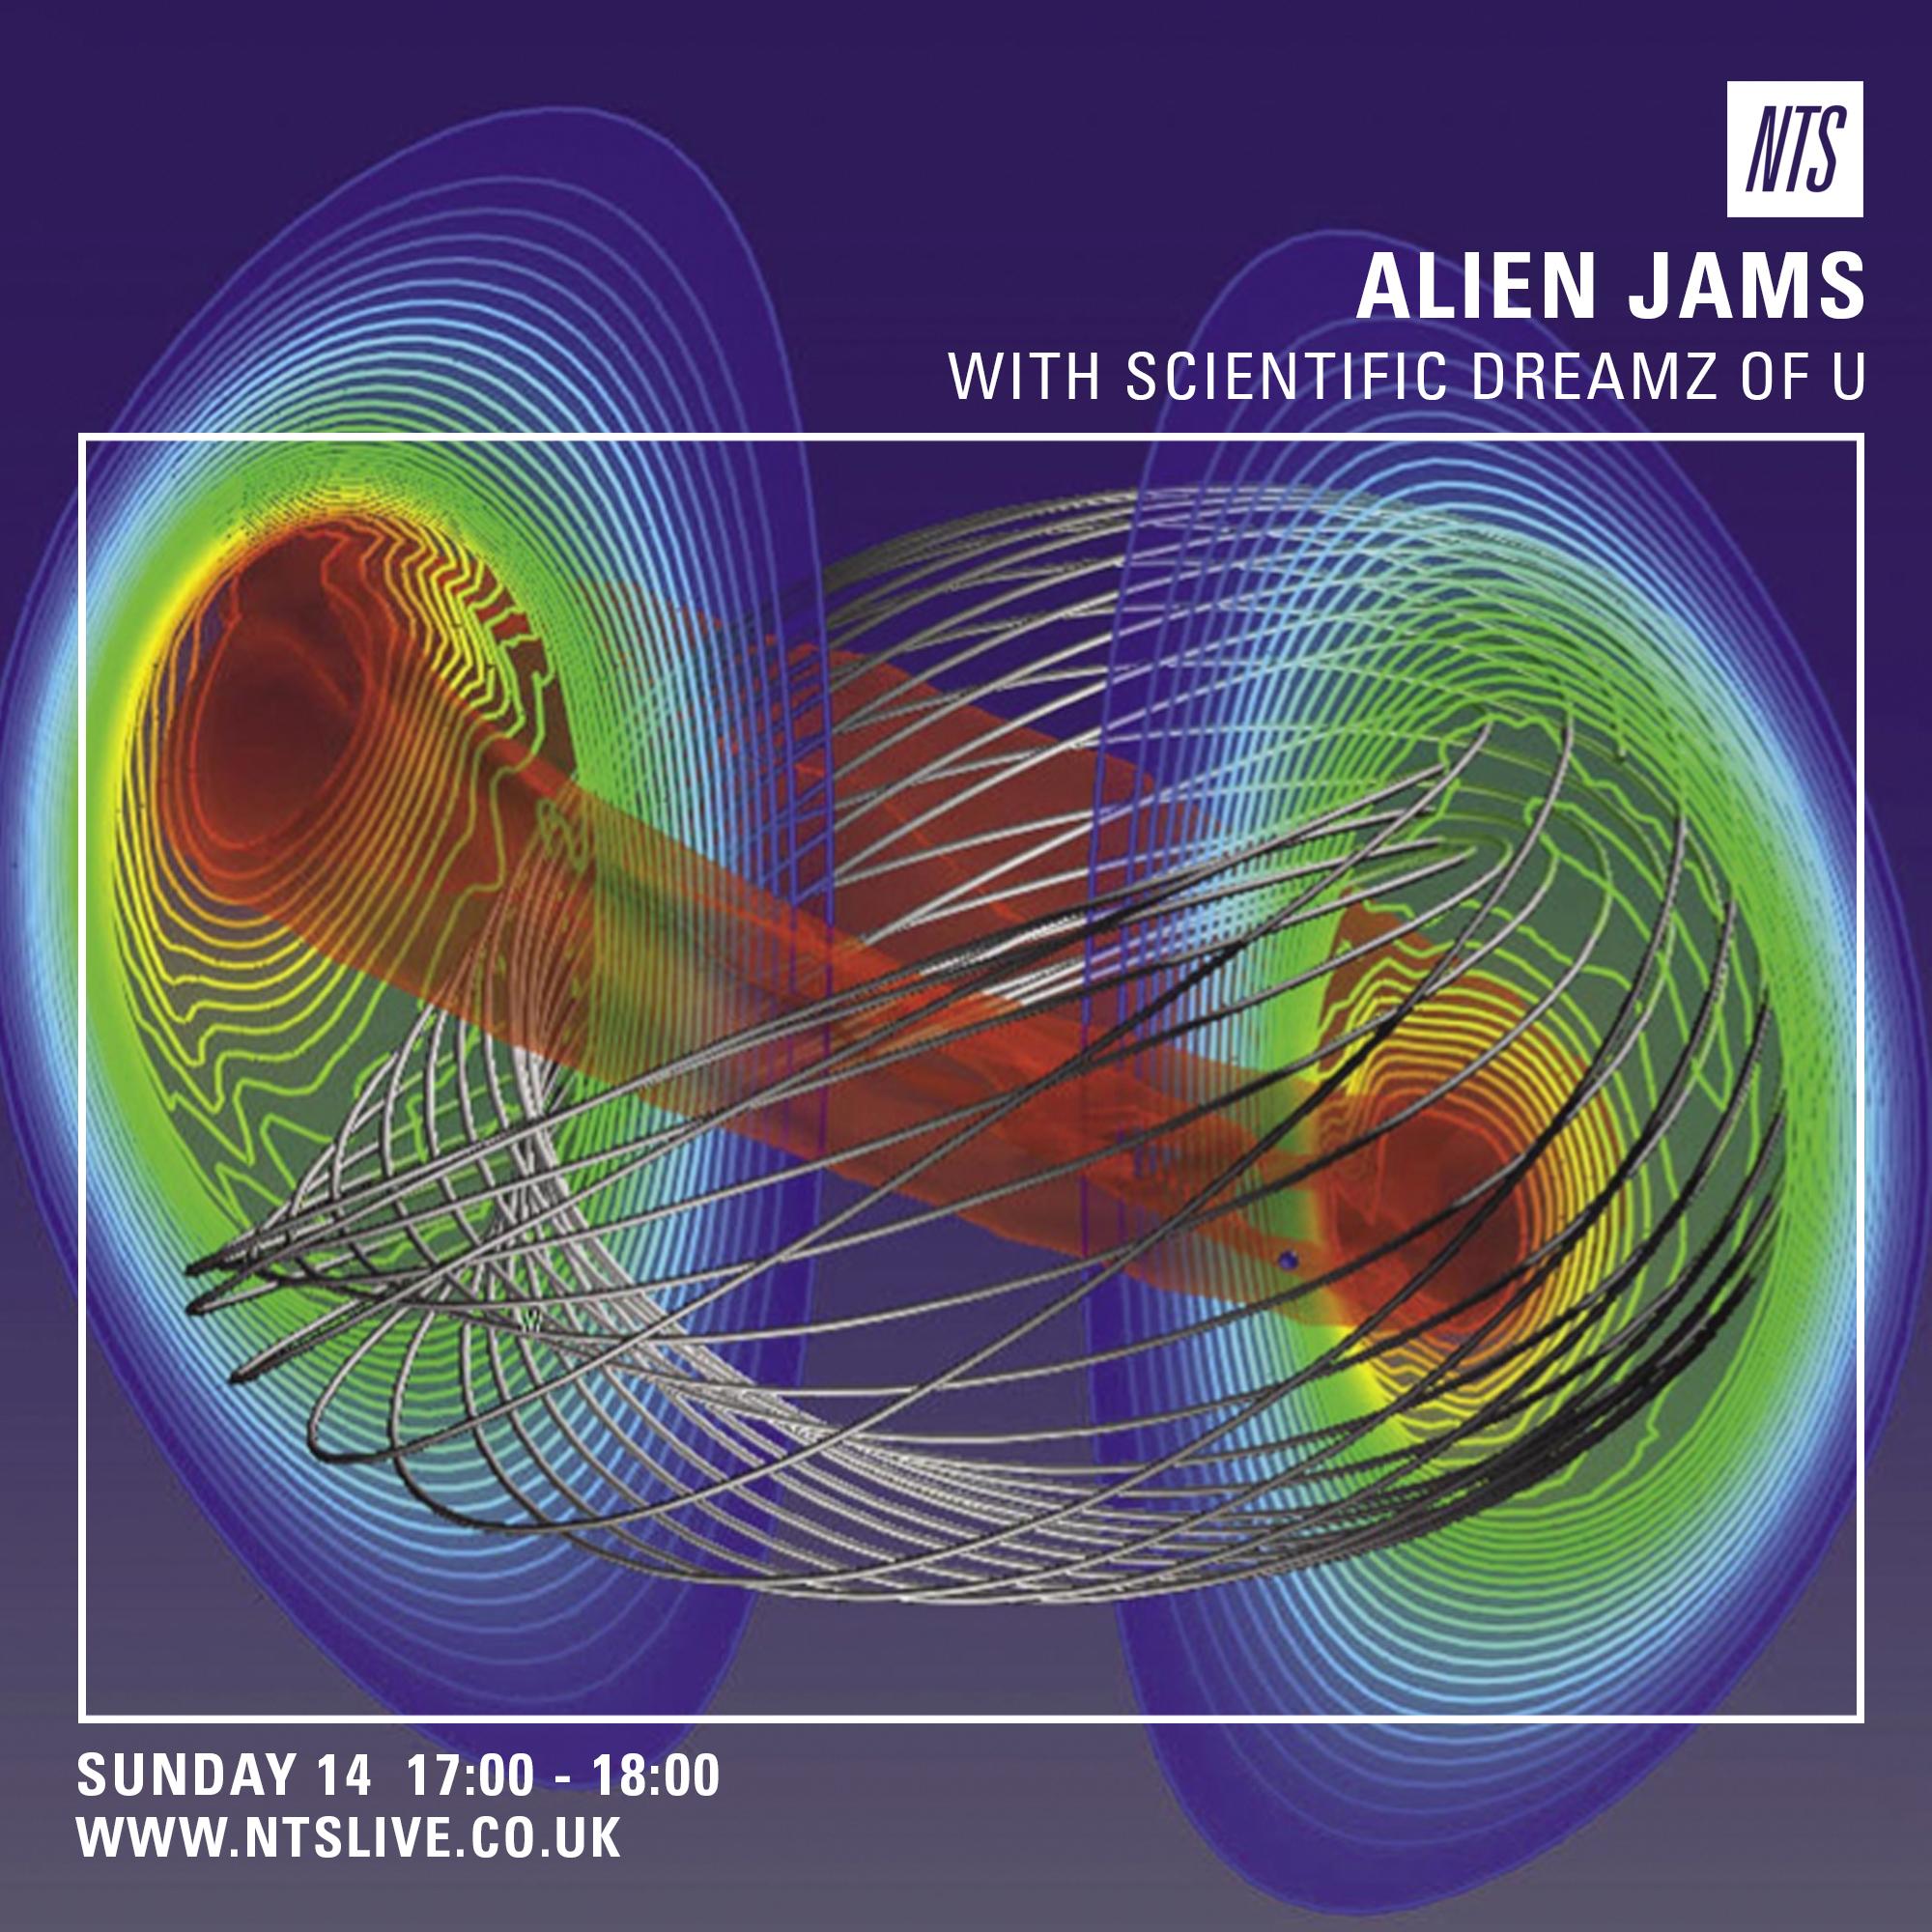 ALIEN JAMS Scientific Dreamz of U